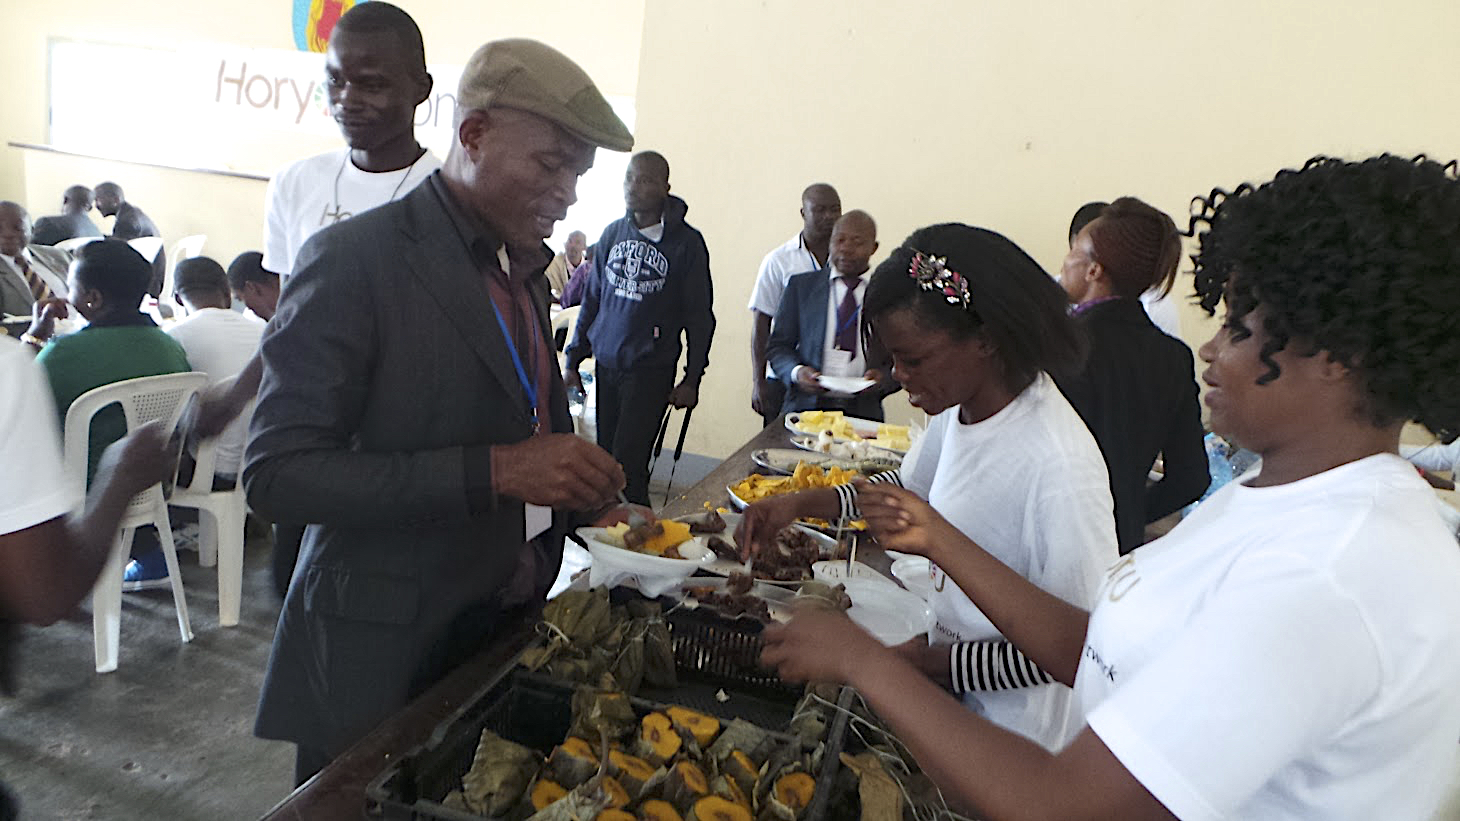 The Meal au Cameroun